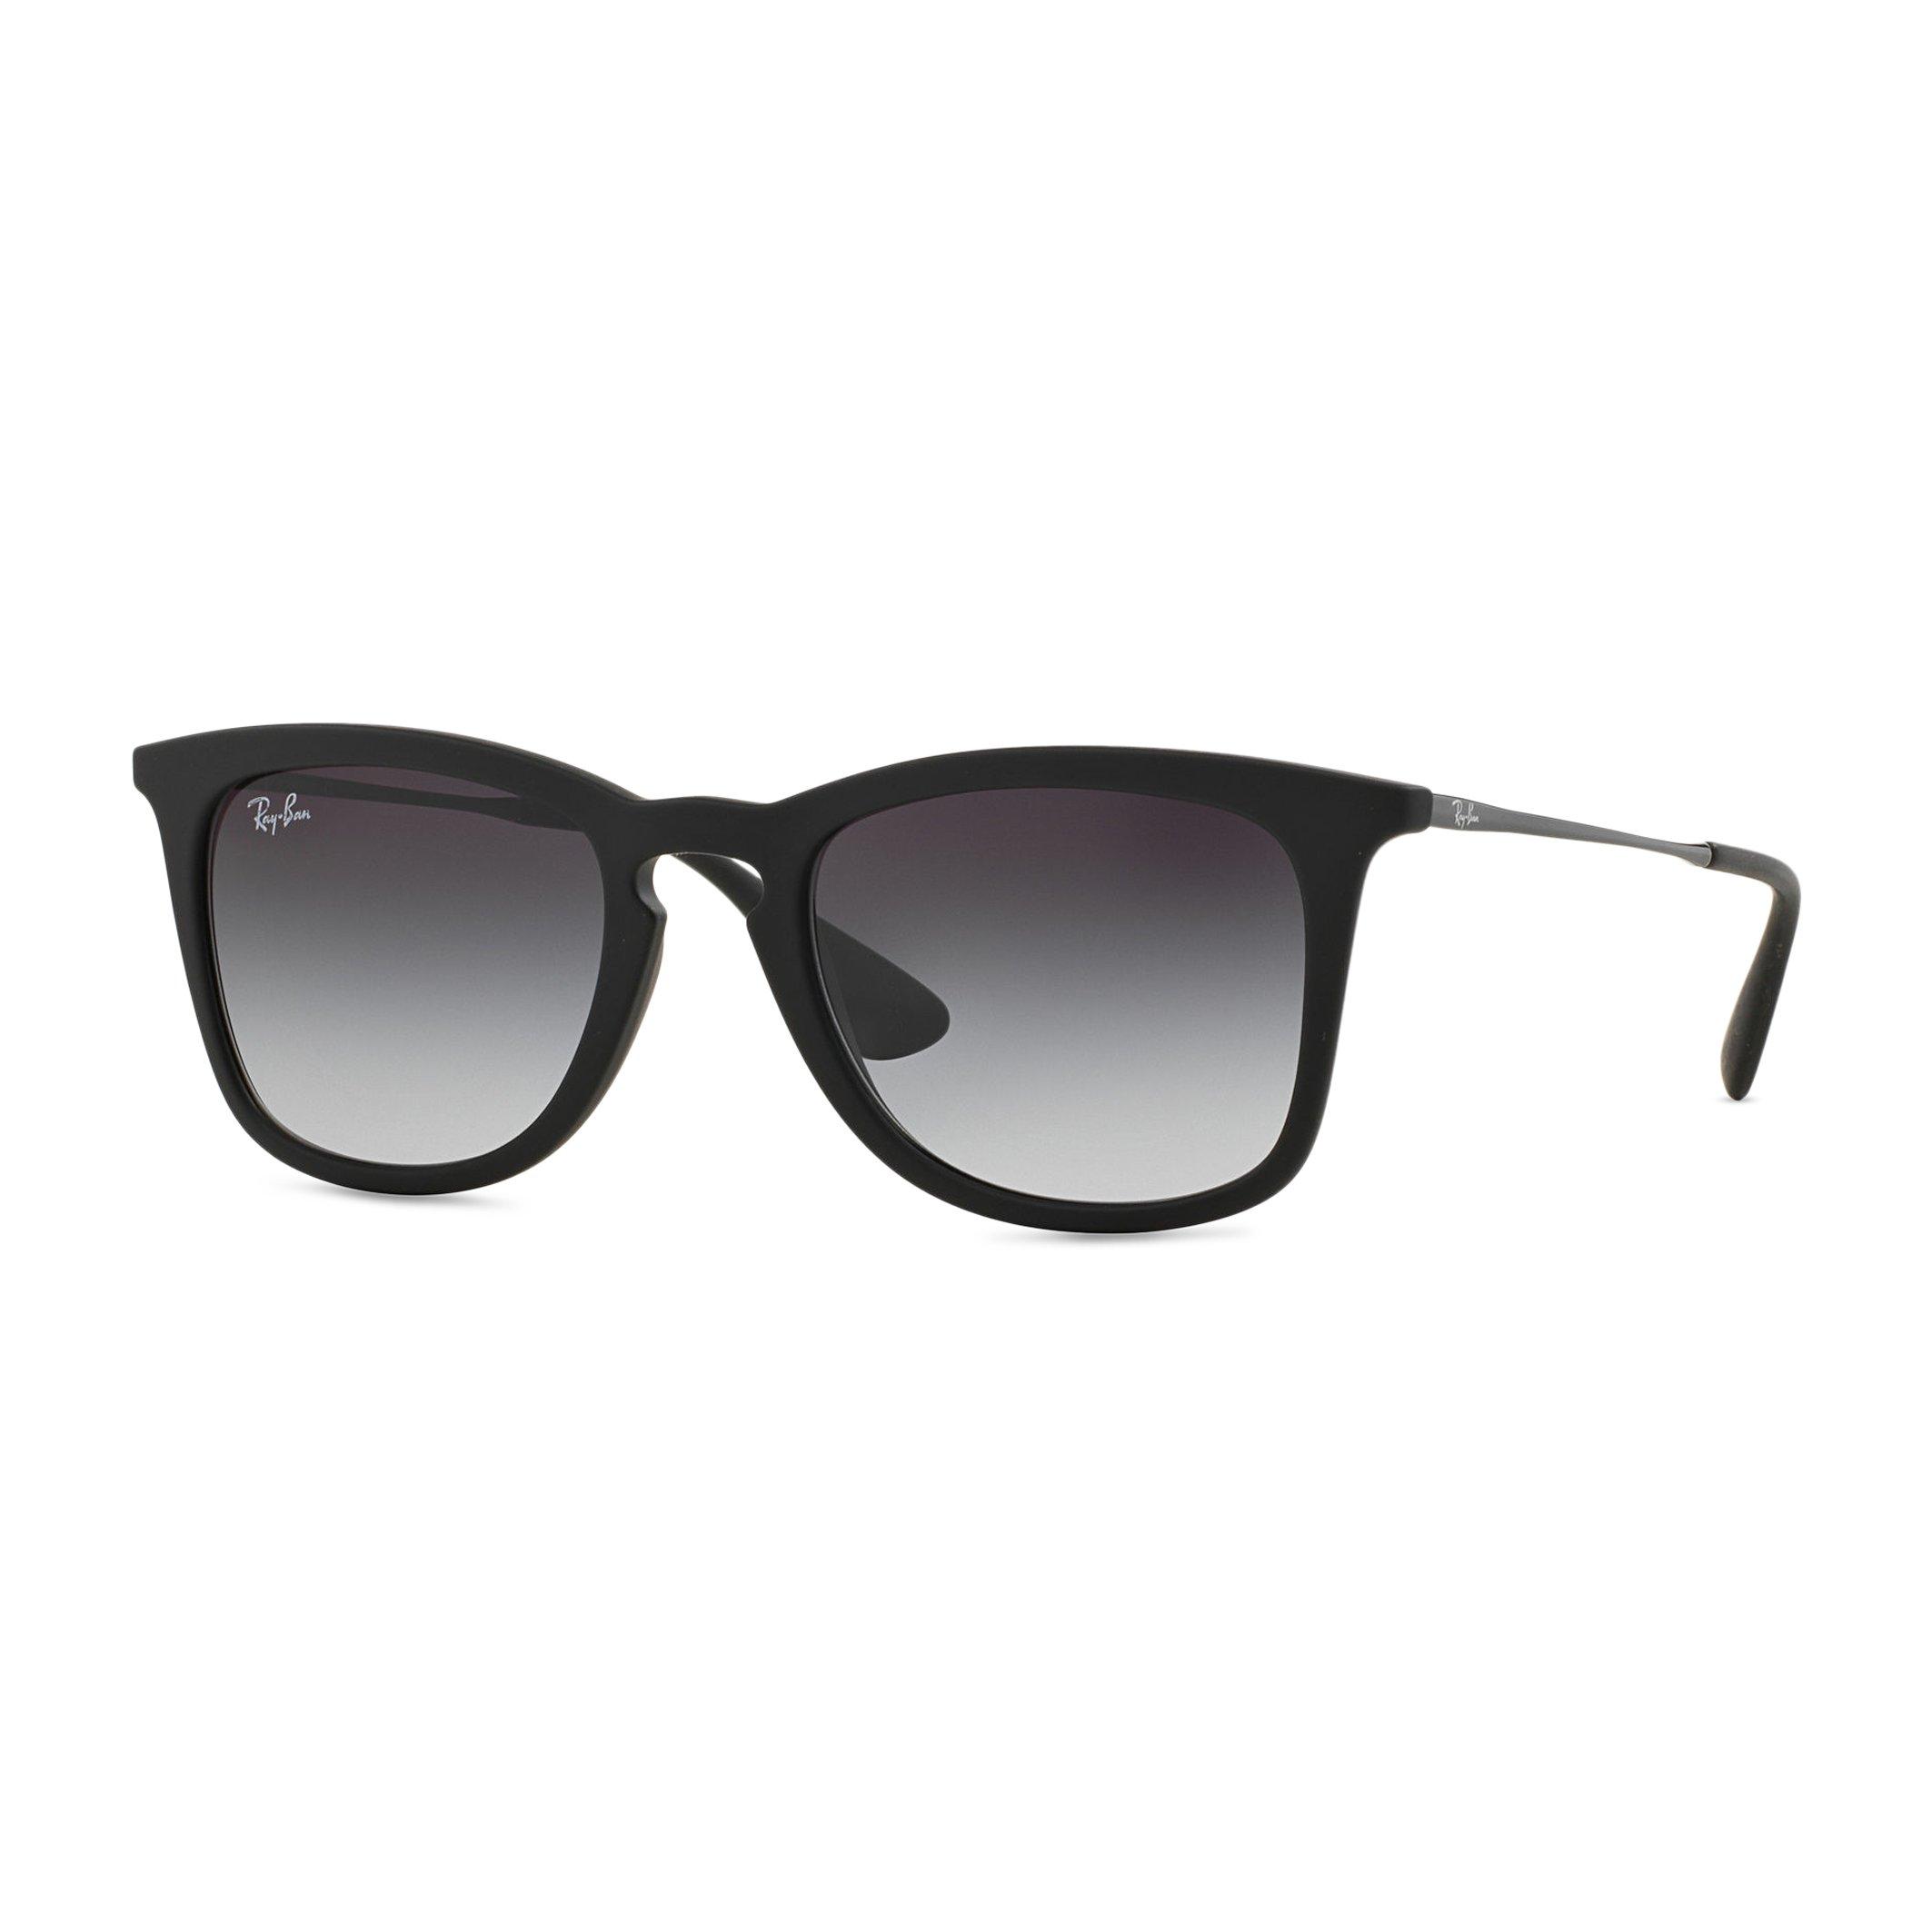 Ray-Ban Unisex Sunglasses Various Colours 0RB4221 - black NOSIZE